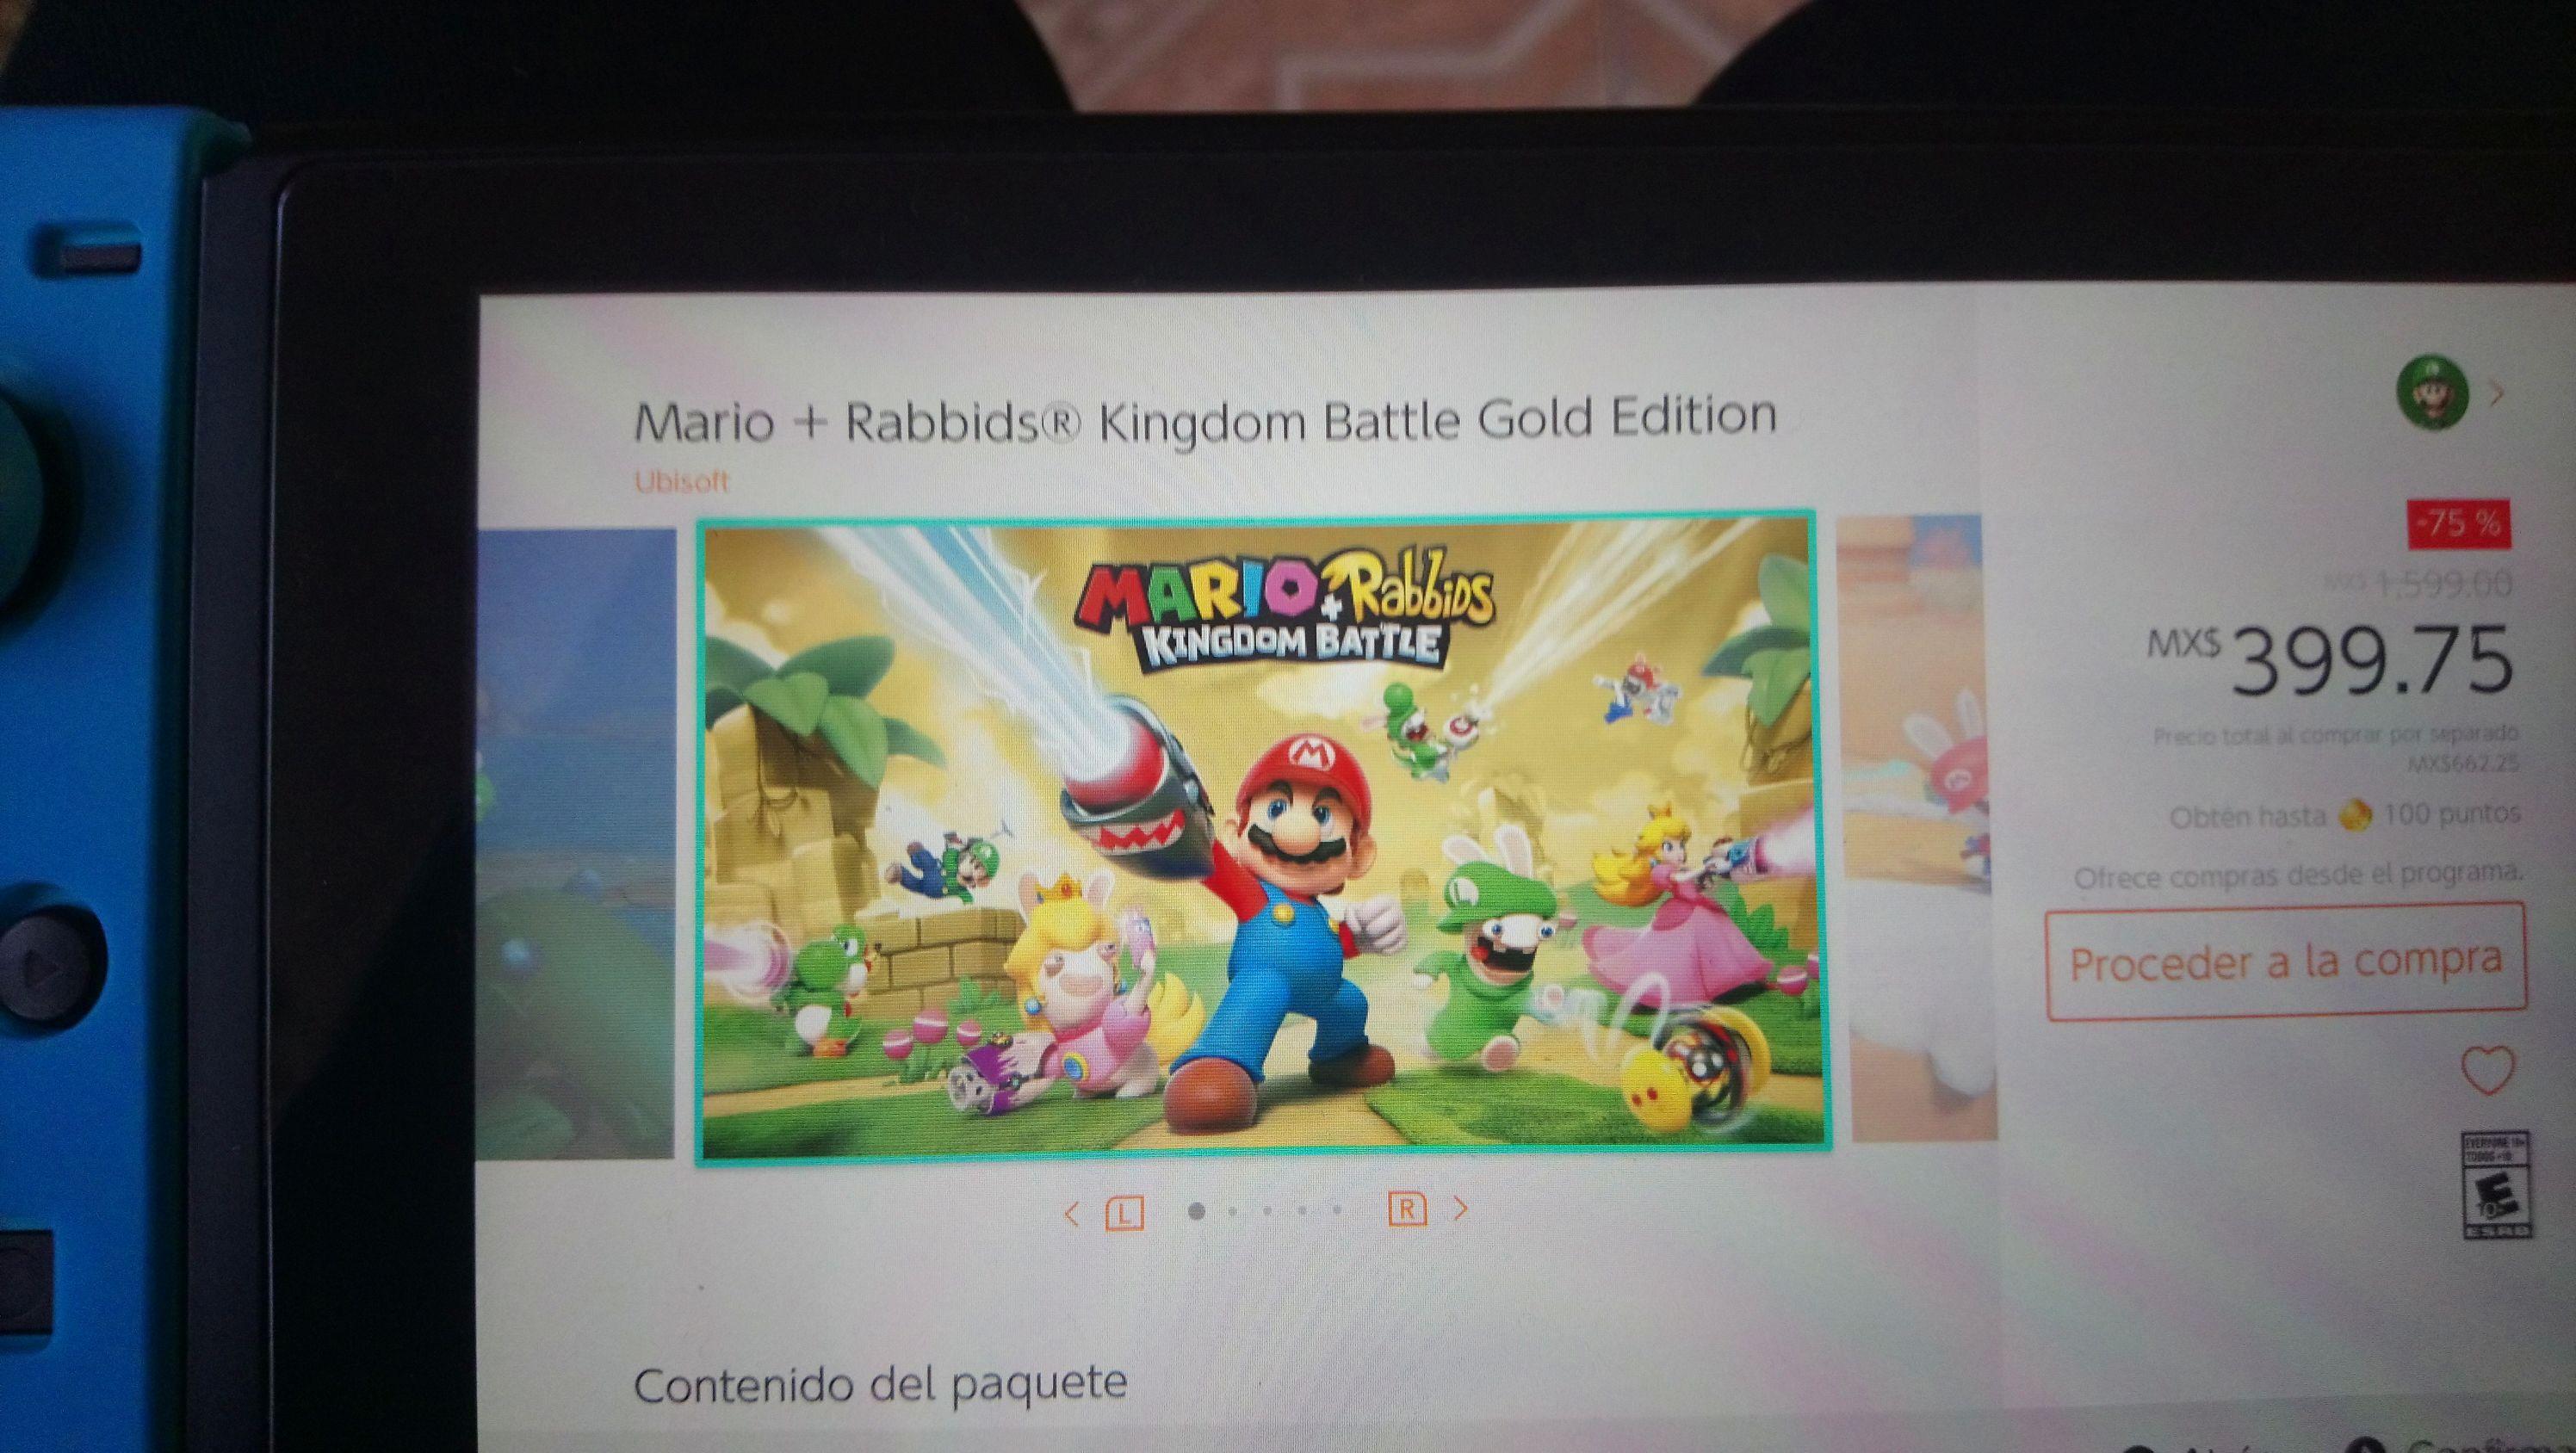 Nintendo eShop: Mario + Rabbids Kingdom Battle Gold Edition